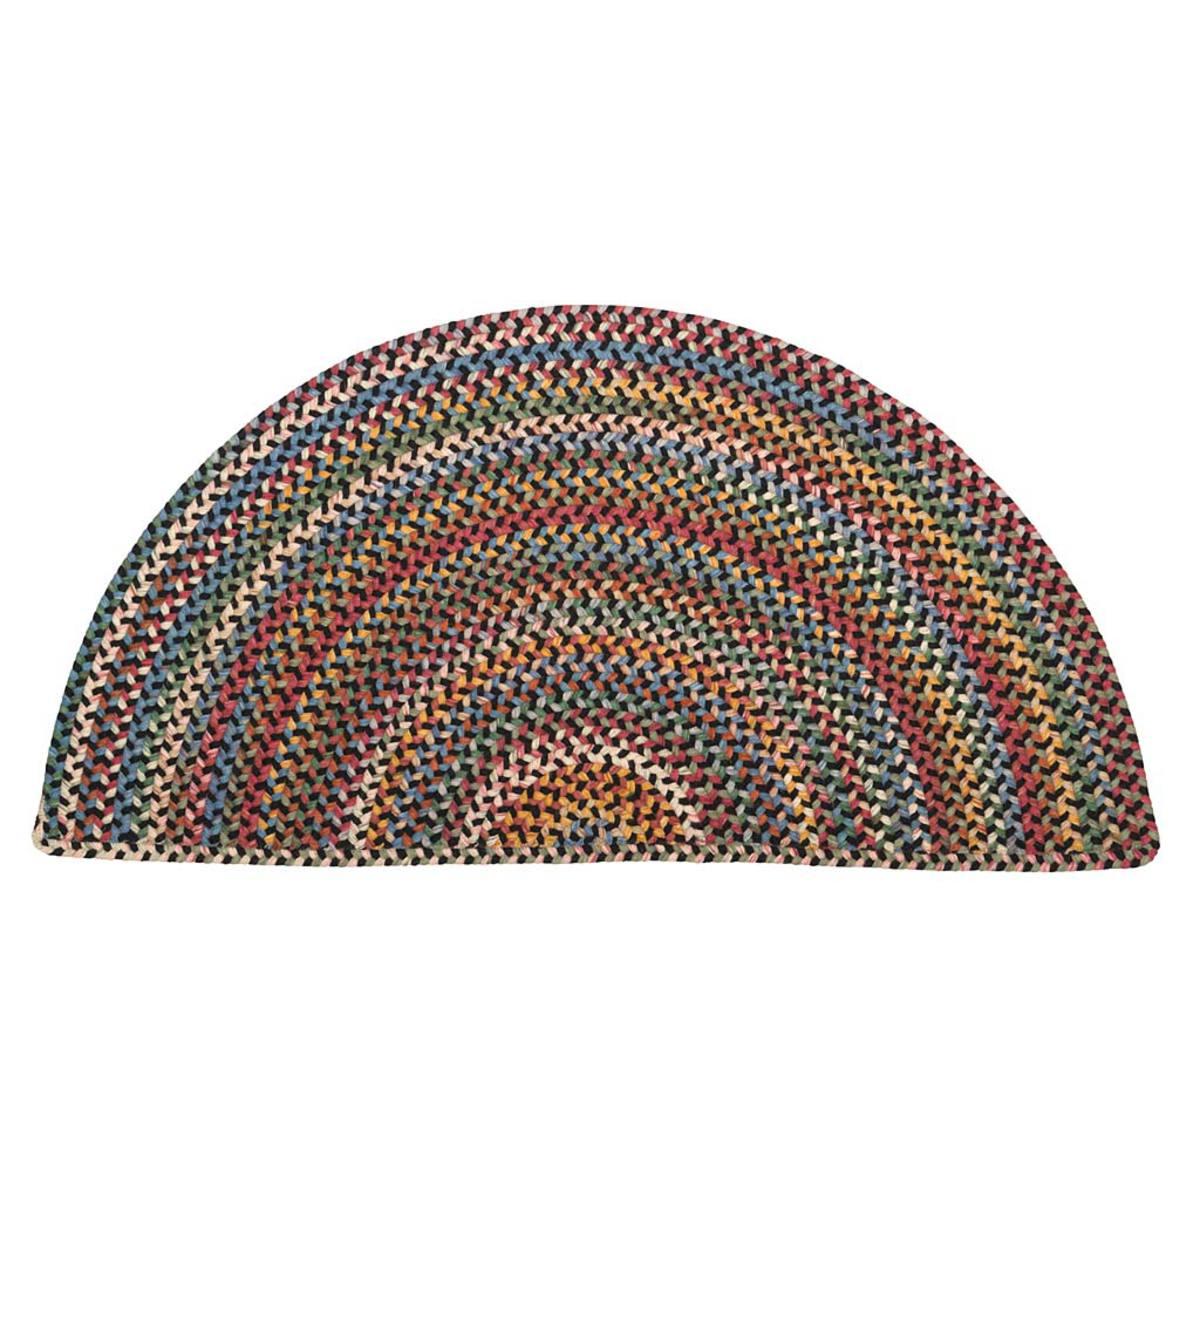 Blue Ridge Half Round Wool Braided Rug 2 X 4 Braided